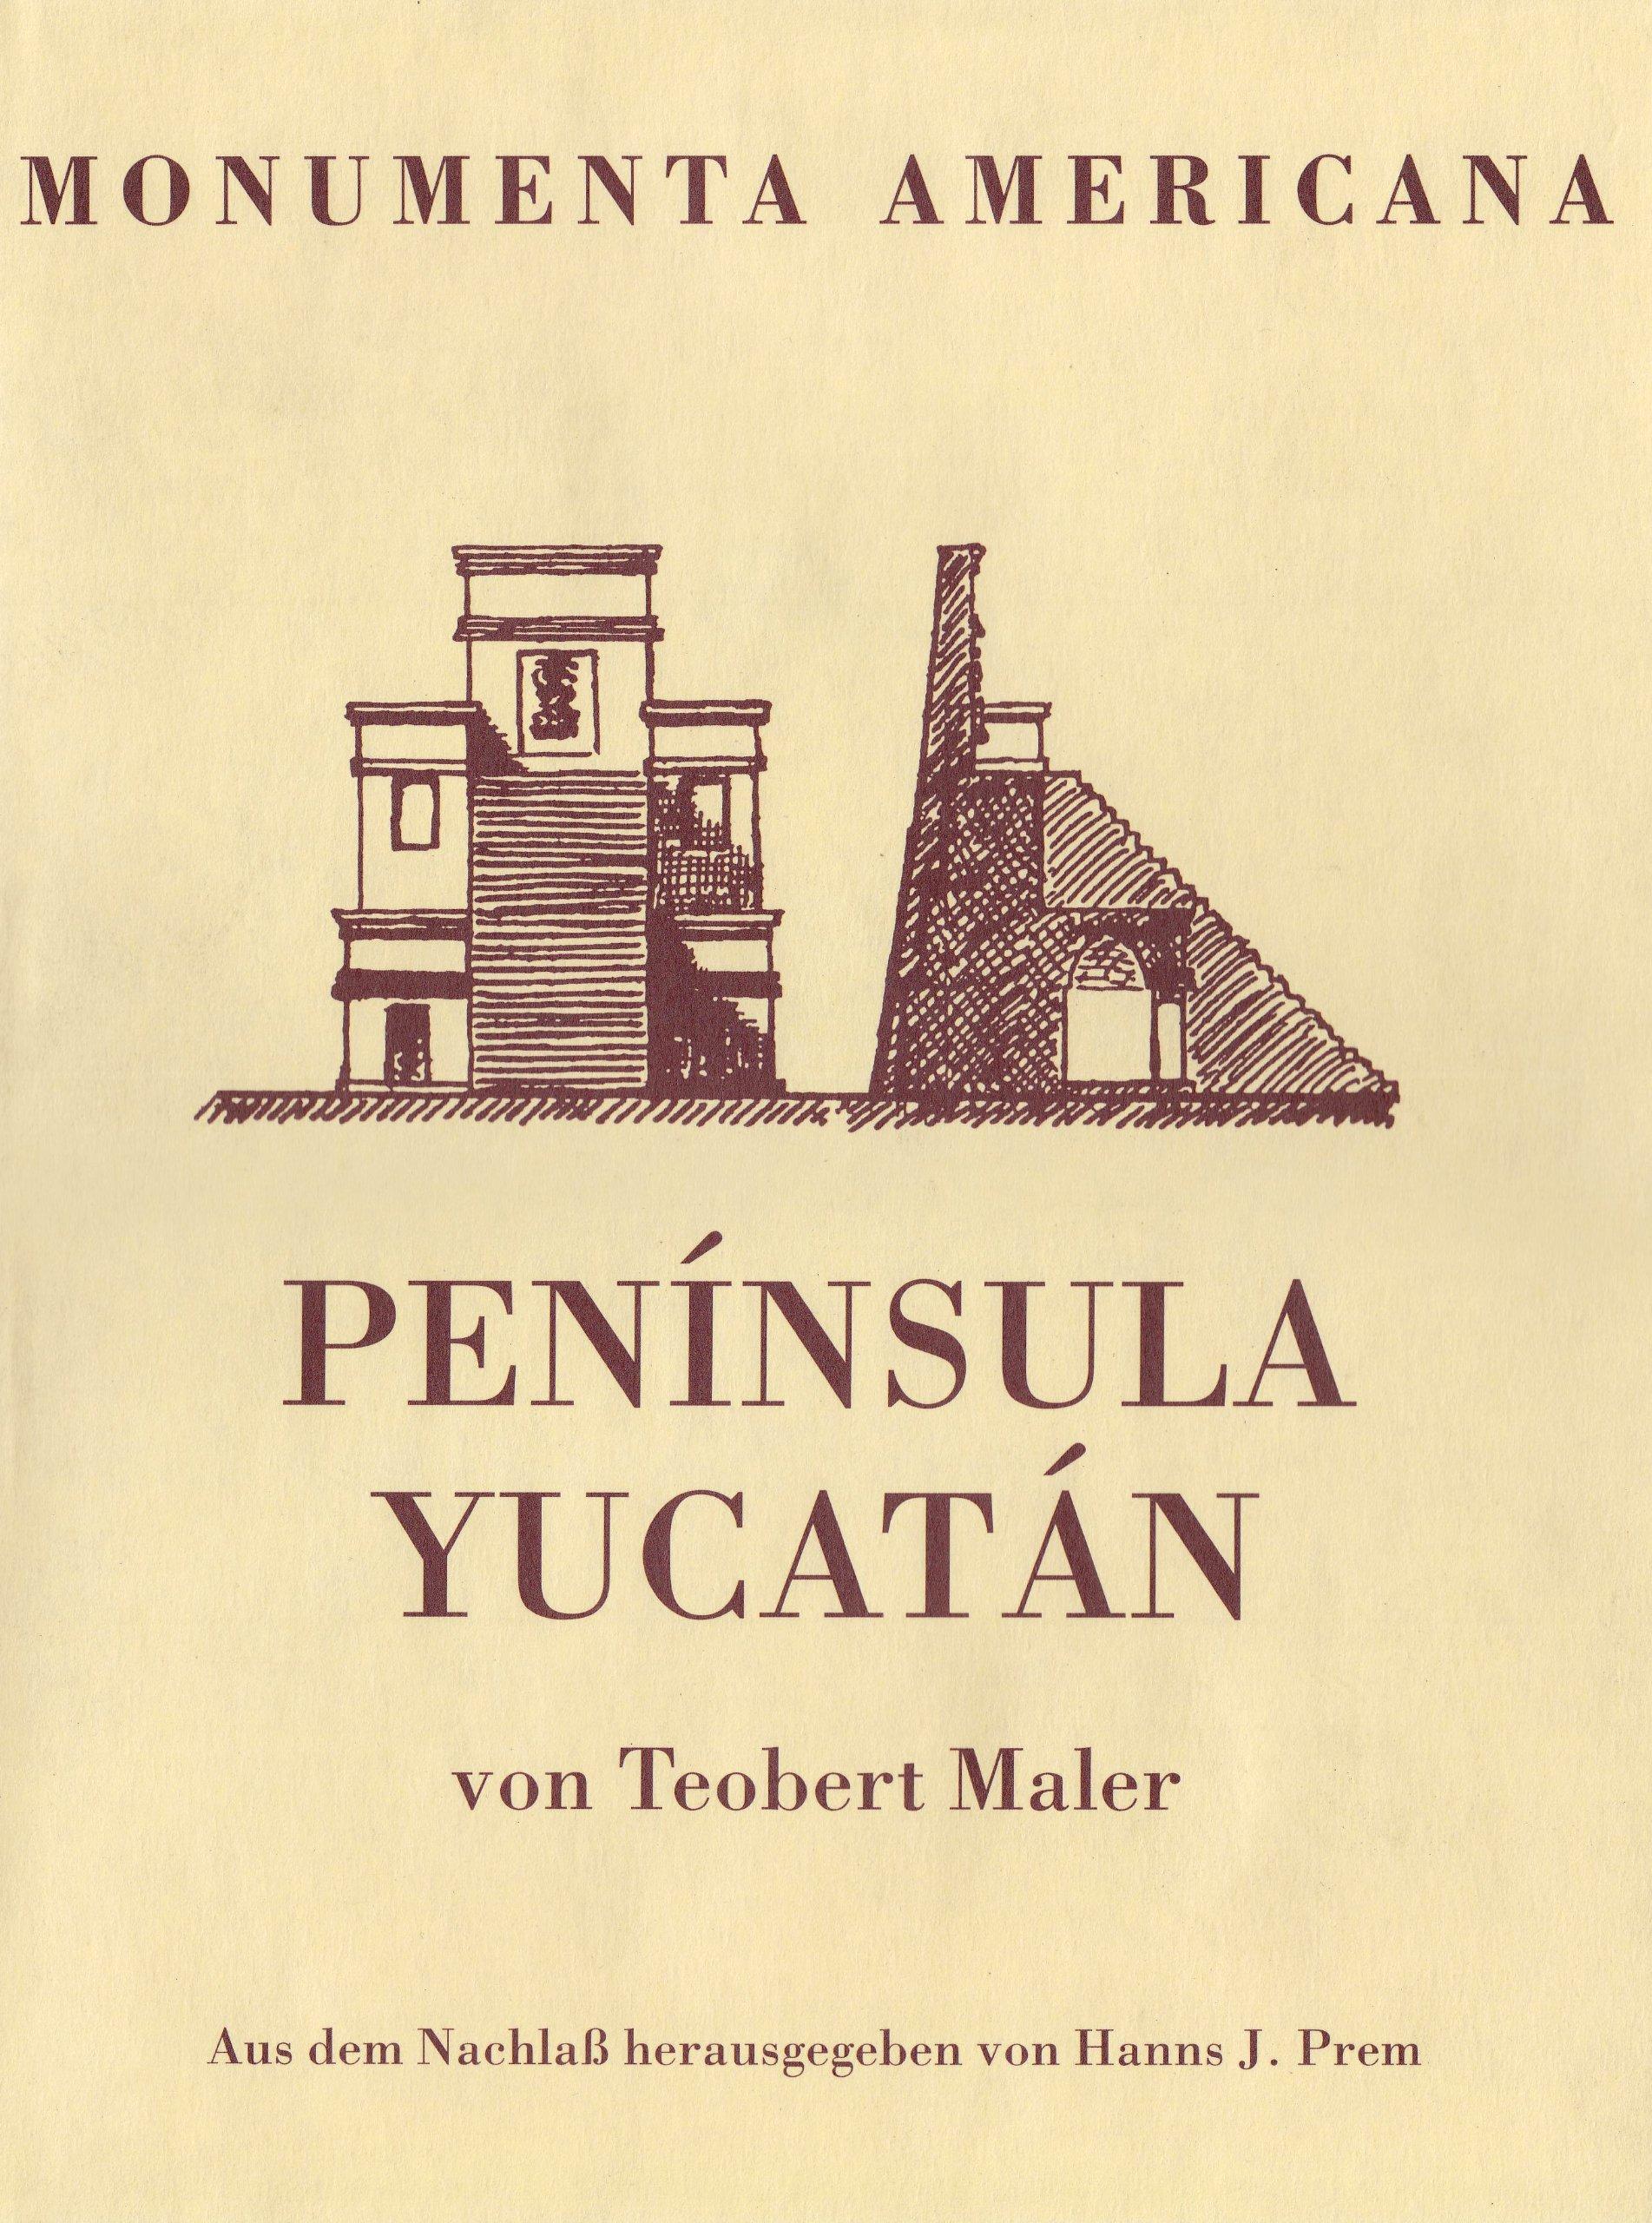 Península Yucatan (Monumenta American)